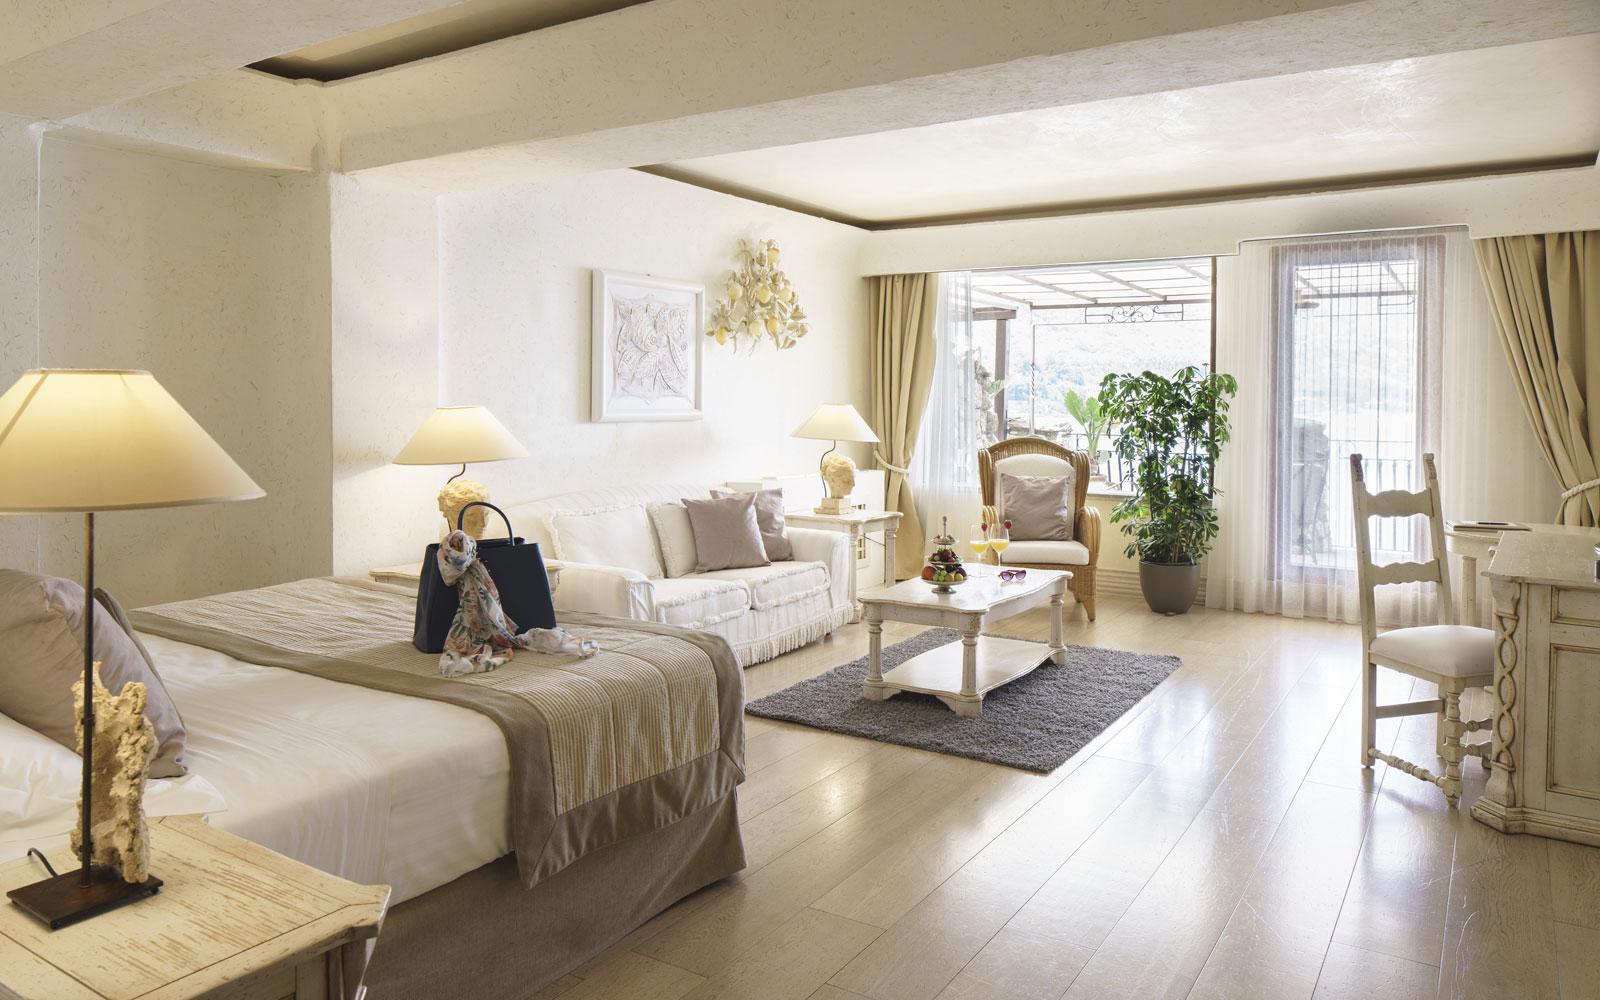 Junior Suite at Grand Hotel Atlantis Bay